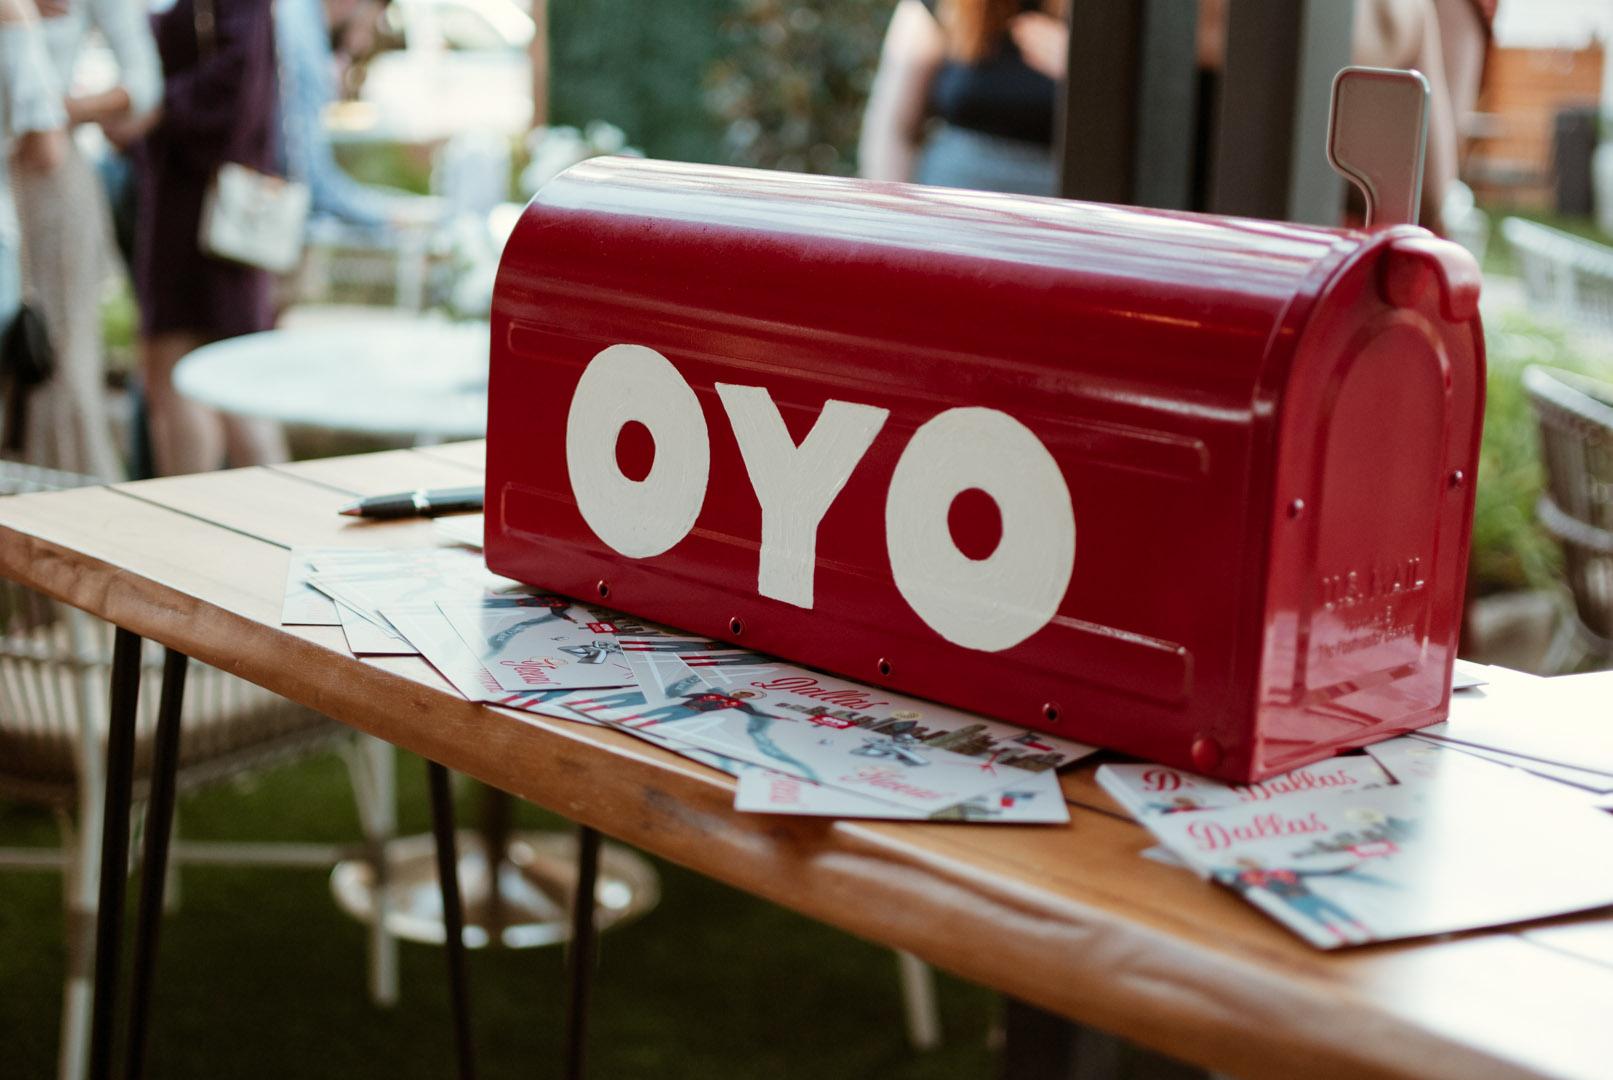 OYO-90.jpg